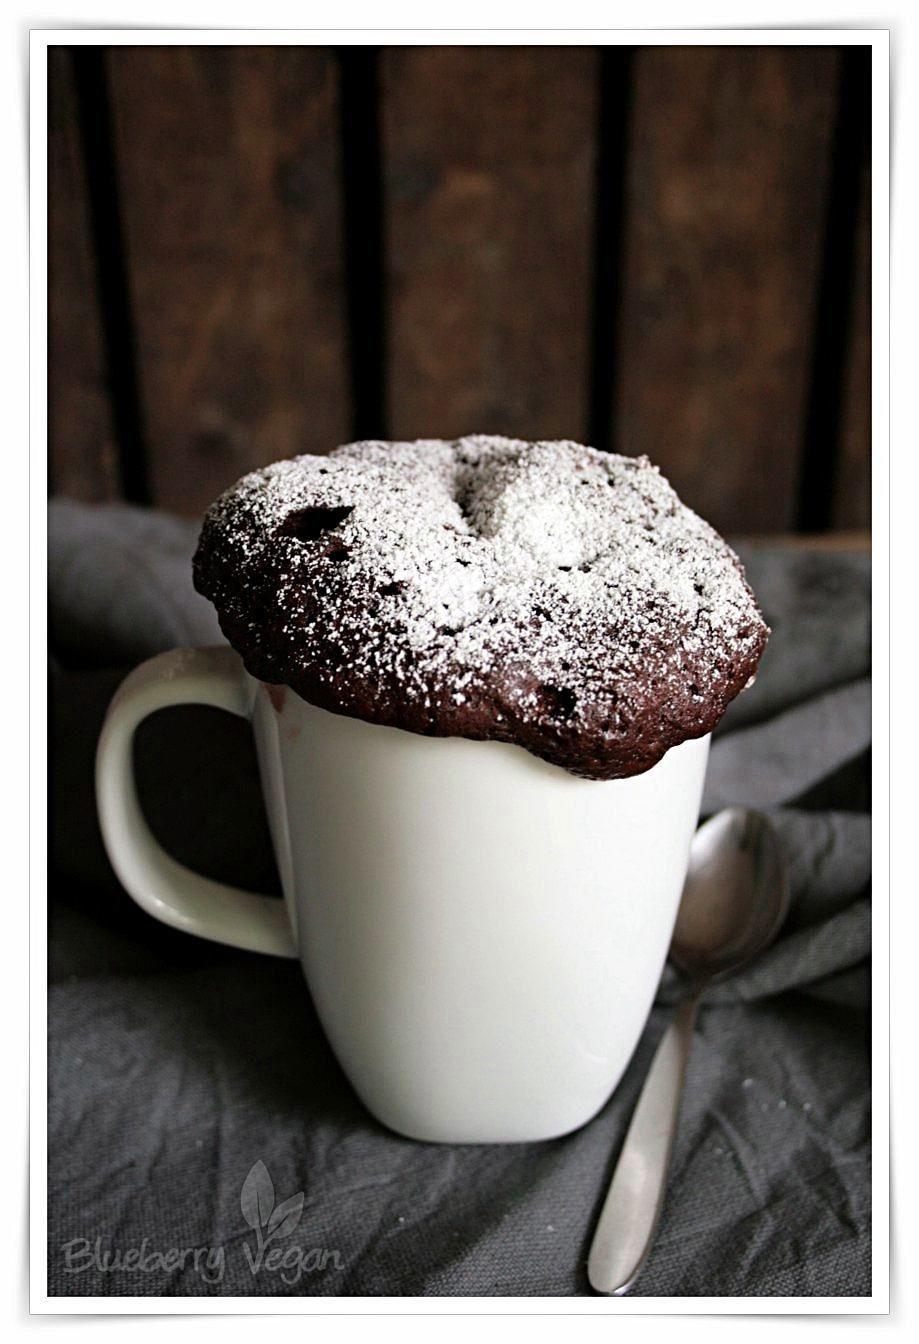 e326dbb01be72a4746a5cbd8a0e73939 - Tassen Kuchen Rezepte